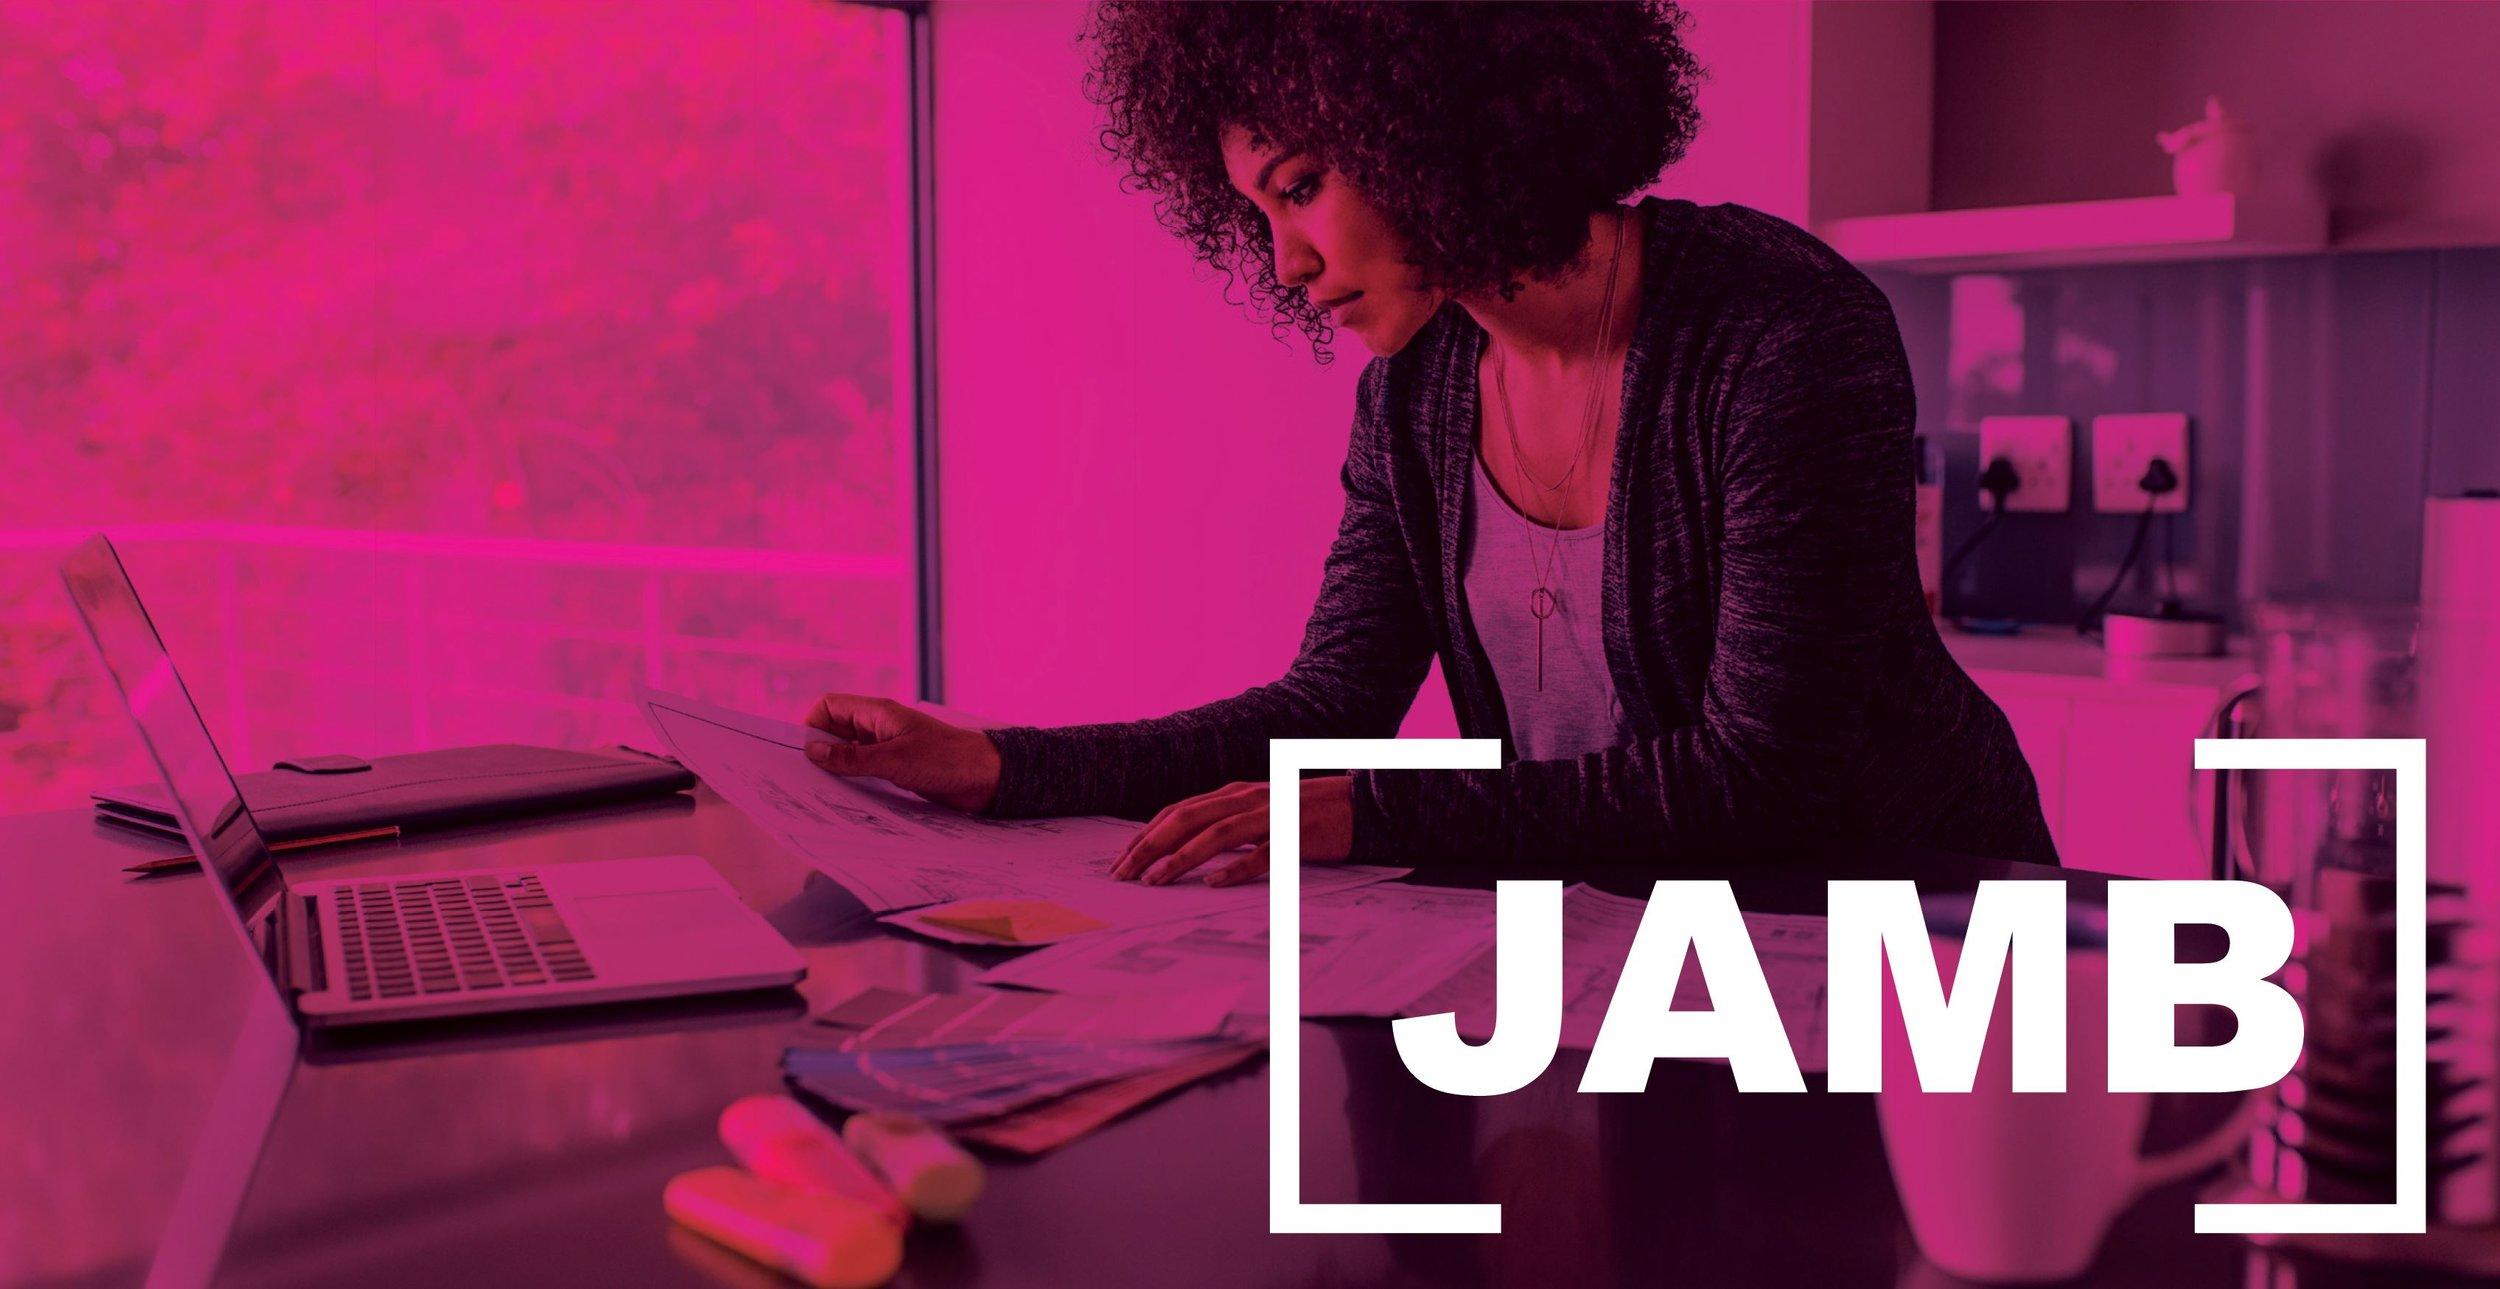 JAMB Home.JPG